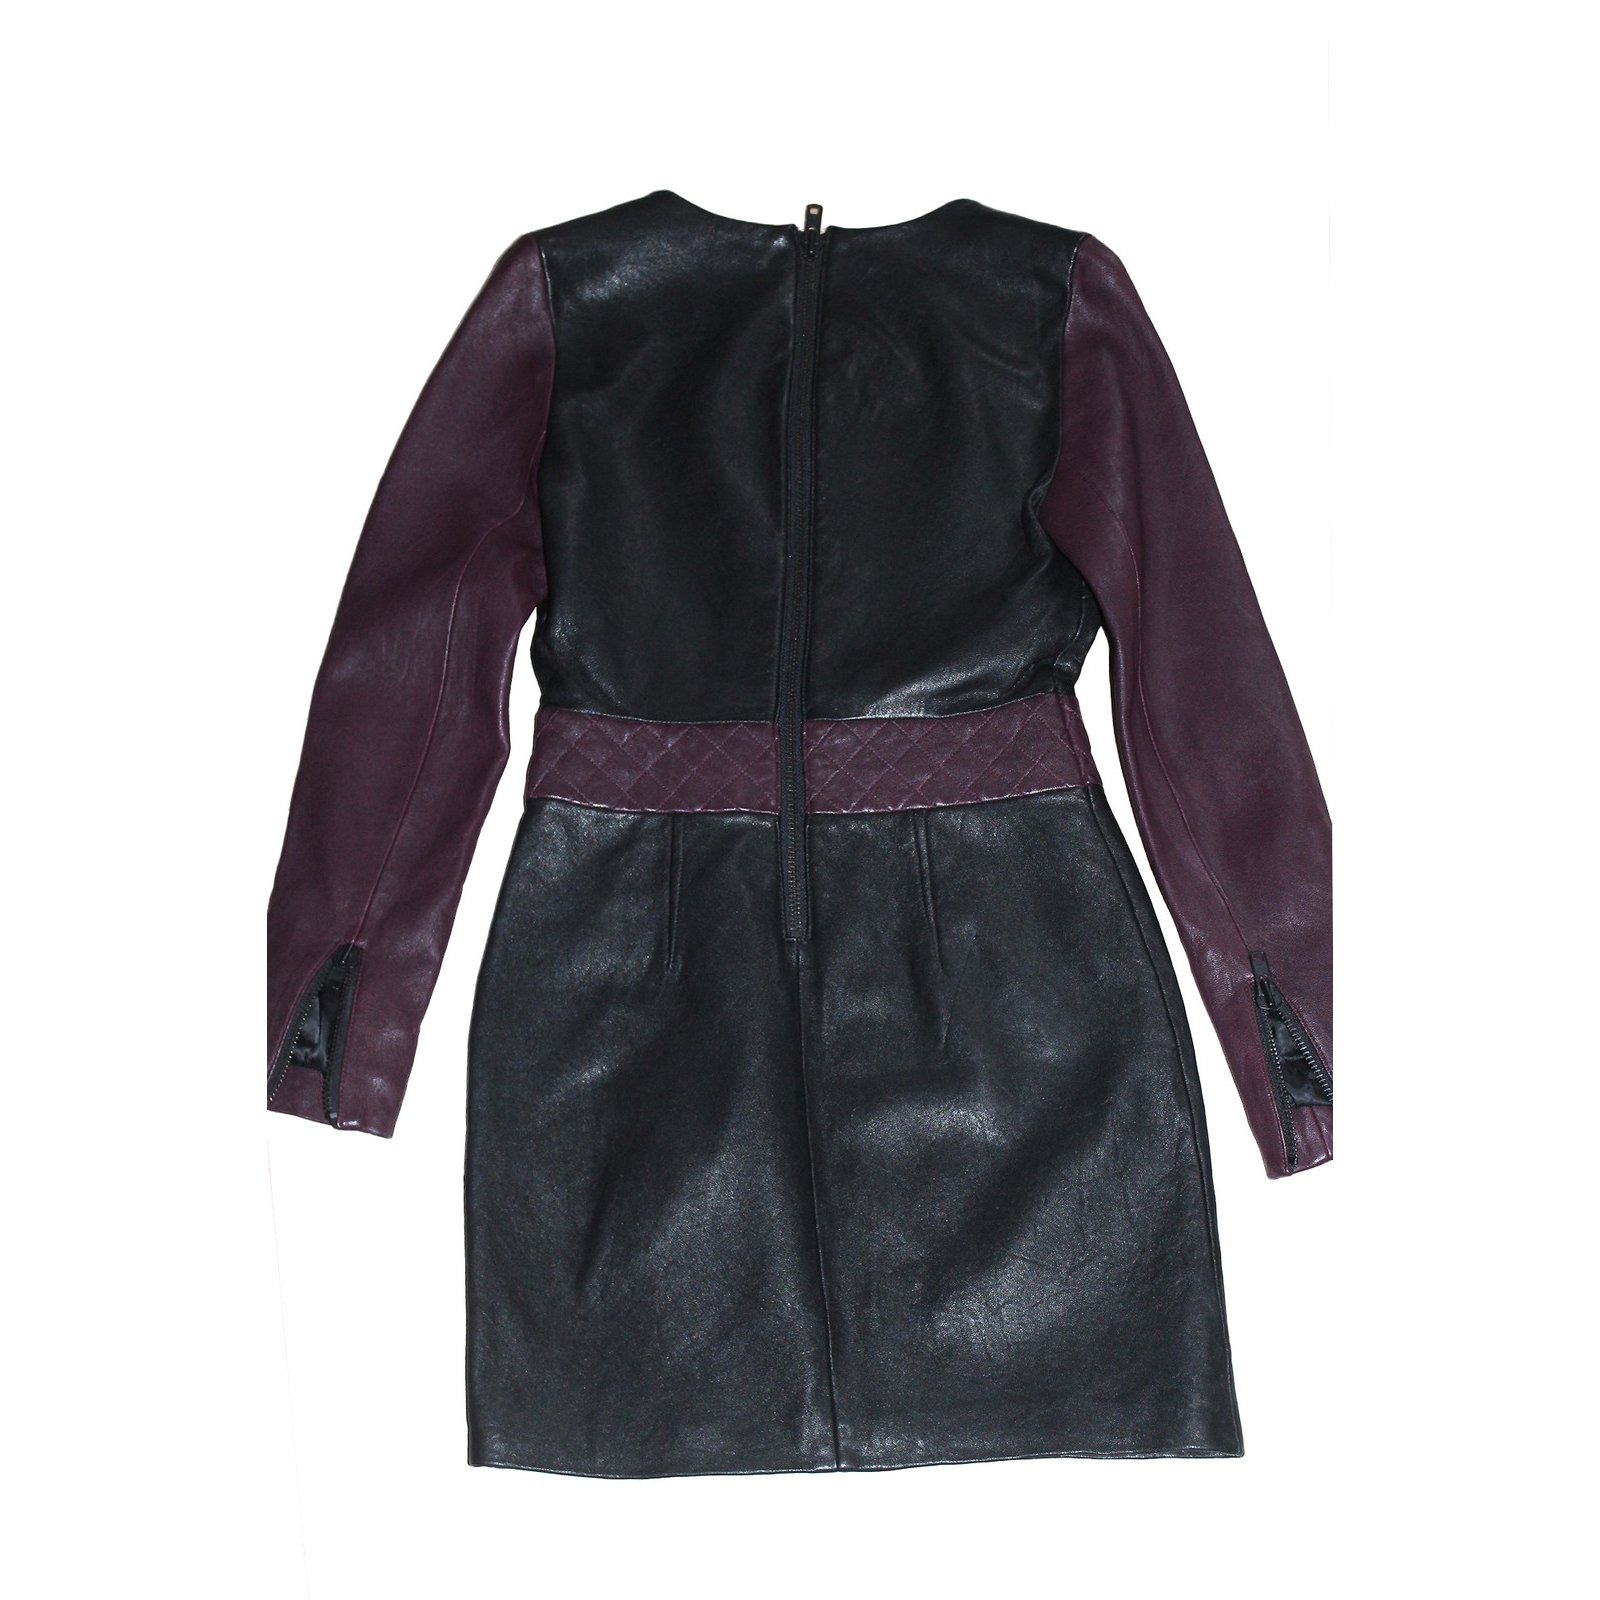 Robes American Retro Robe cuir Cuir Noir ref.6275 - Joli Closet 062bce1be8c6